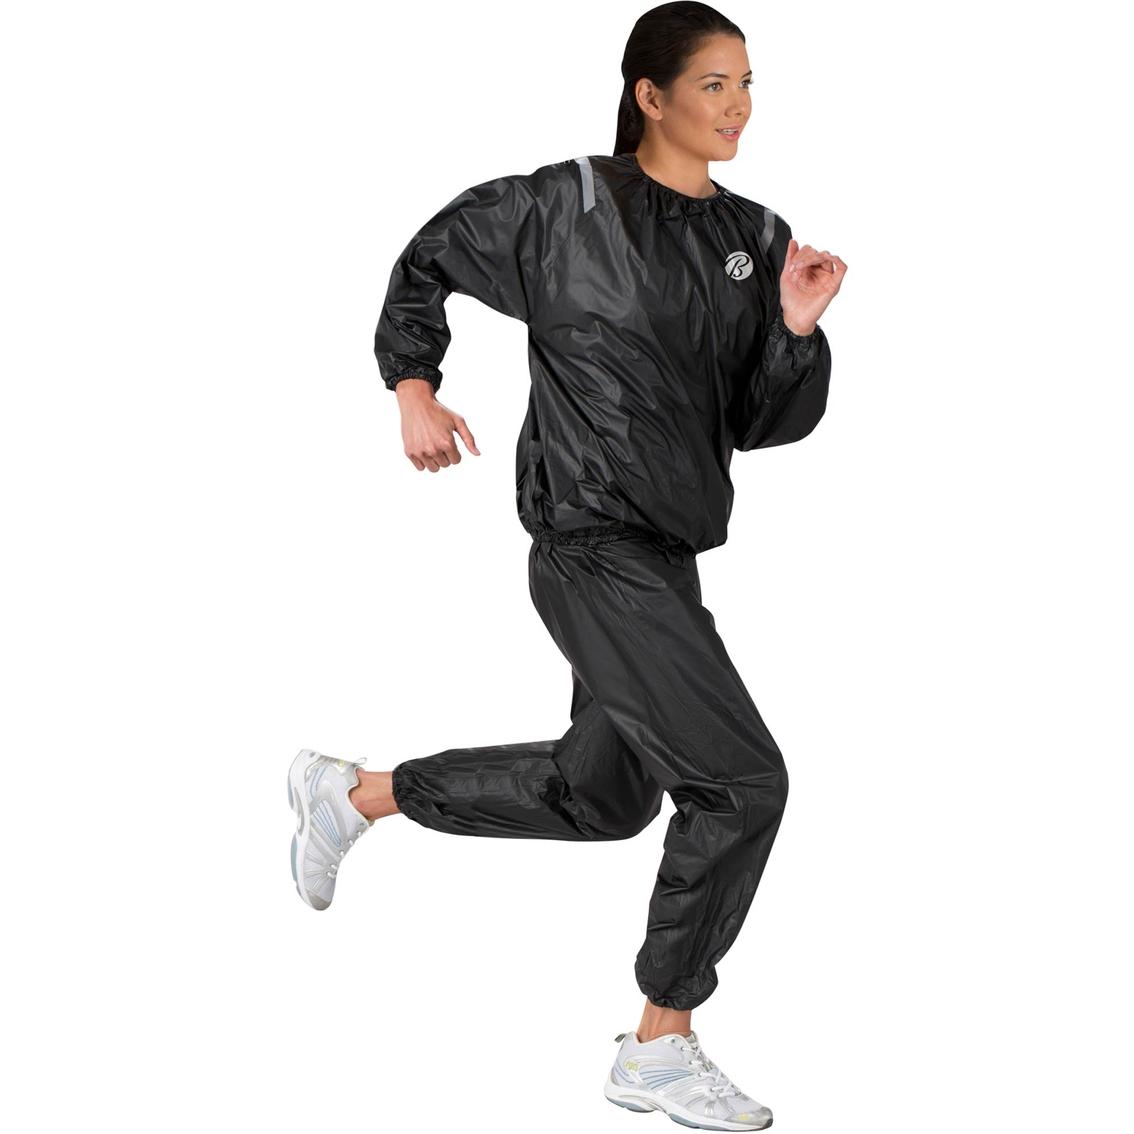 Bally Total Fitness Sauna Suit L/xl   Fitness Accessories   Sports